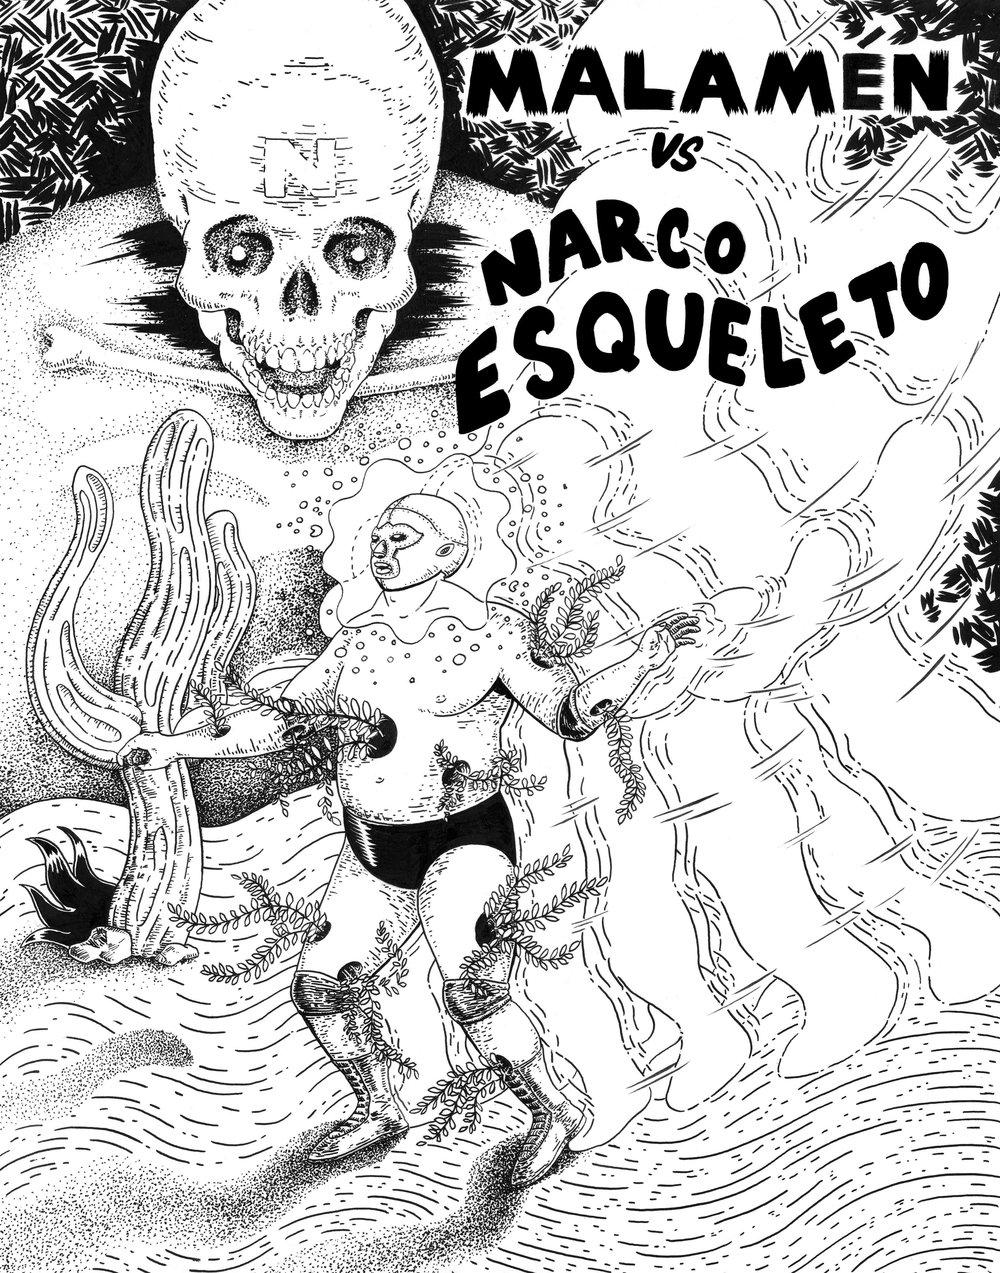 Vs Narco Esqueleto